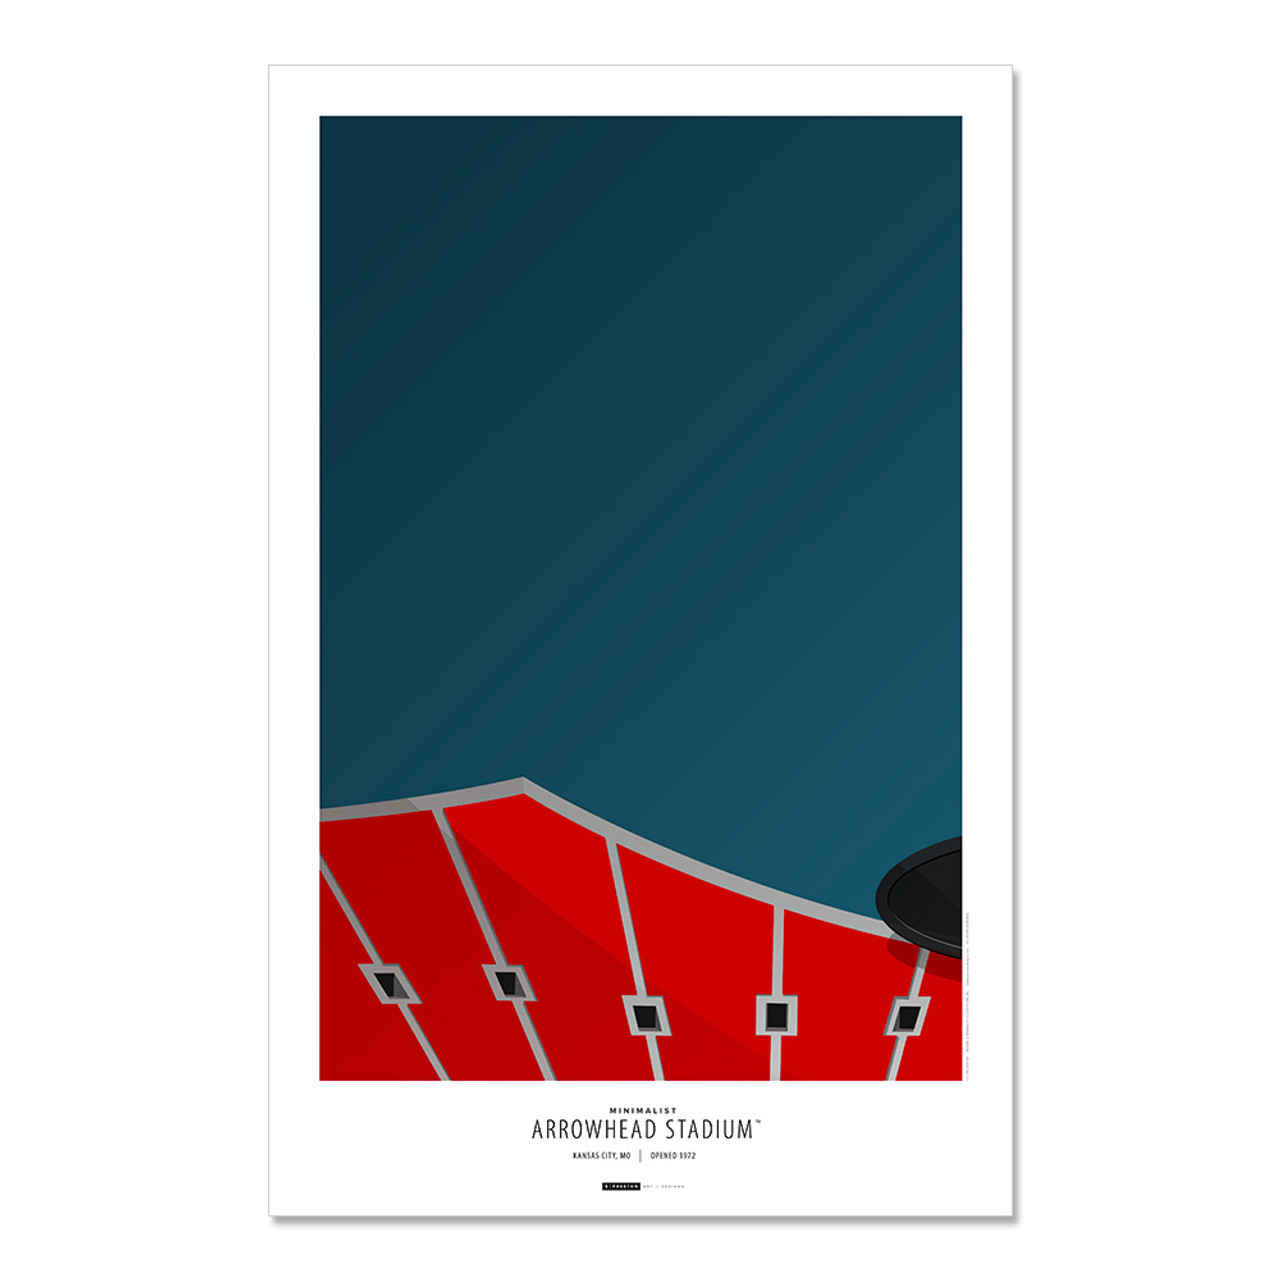 Kansas City Chiefs - Arrowhead Stadium Art Poster